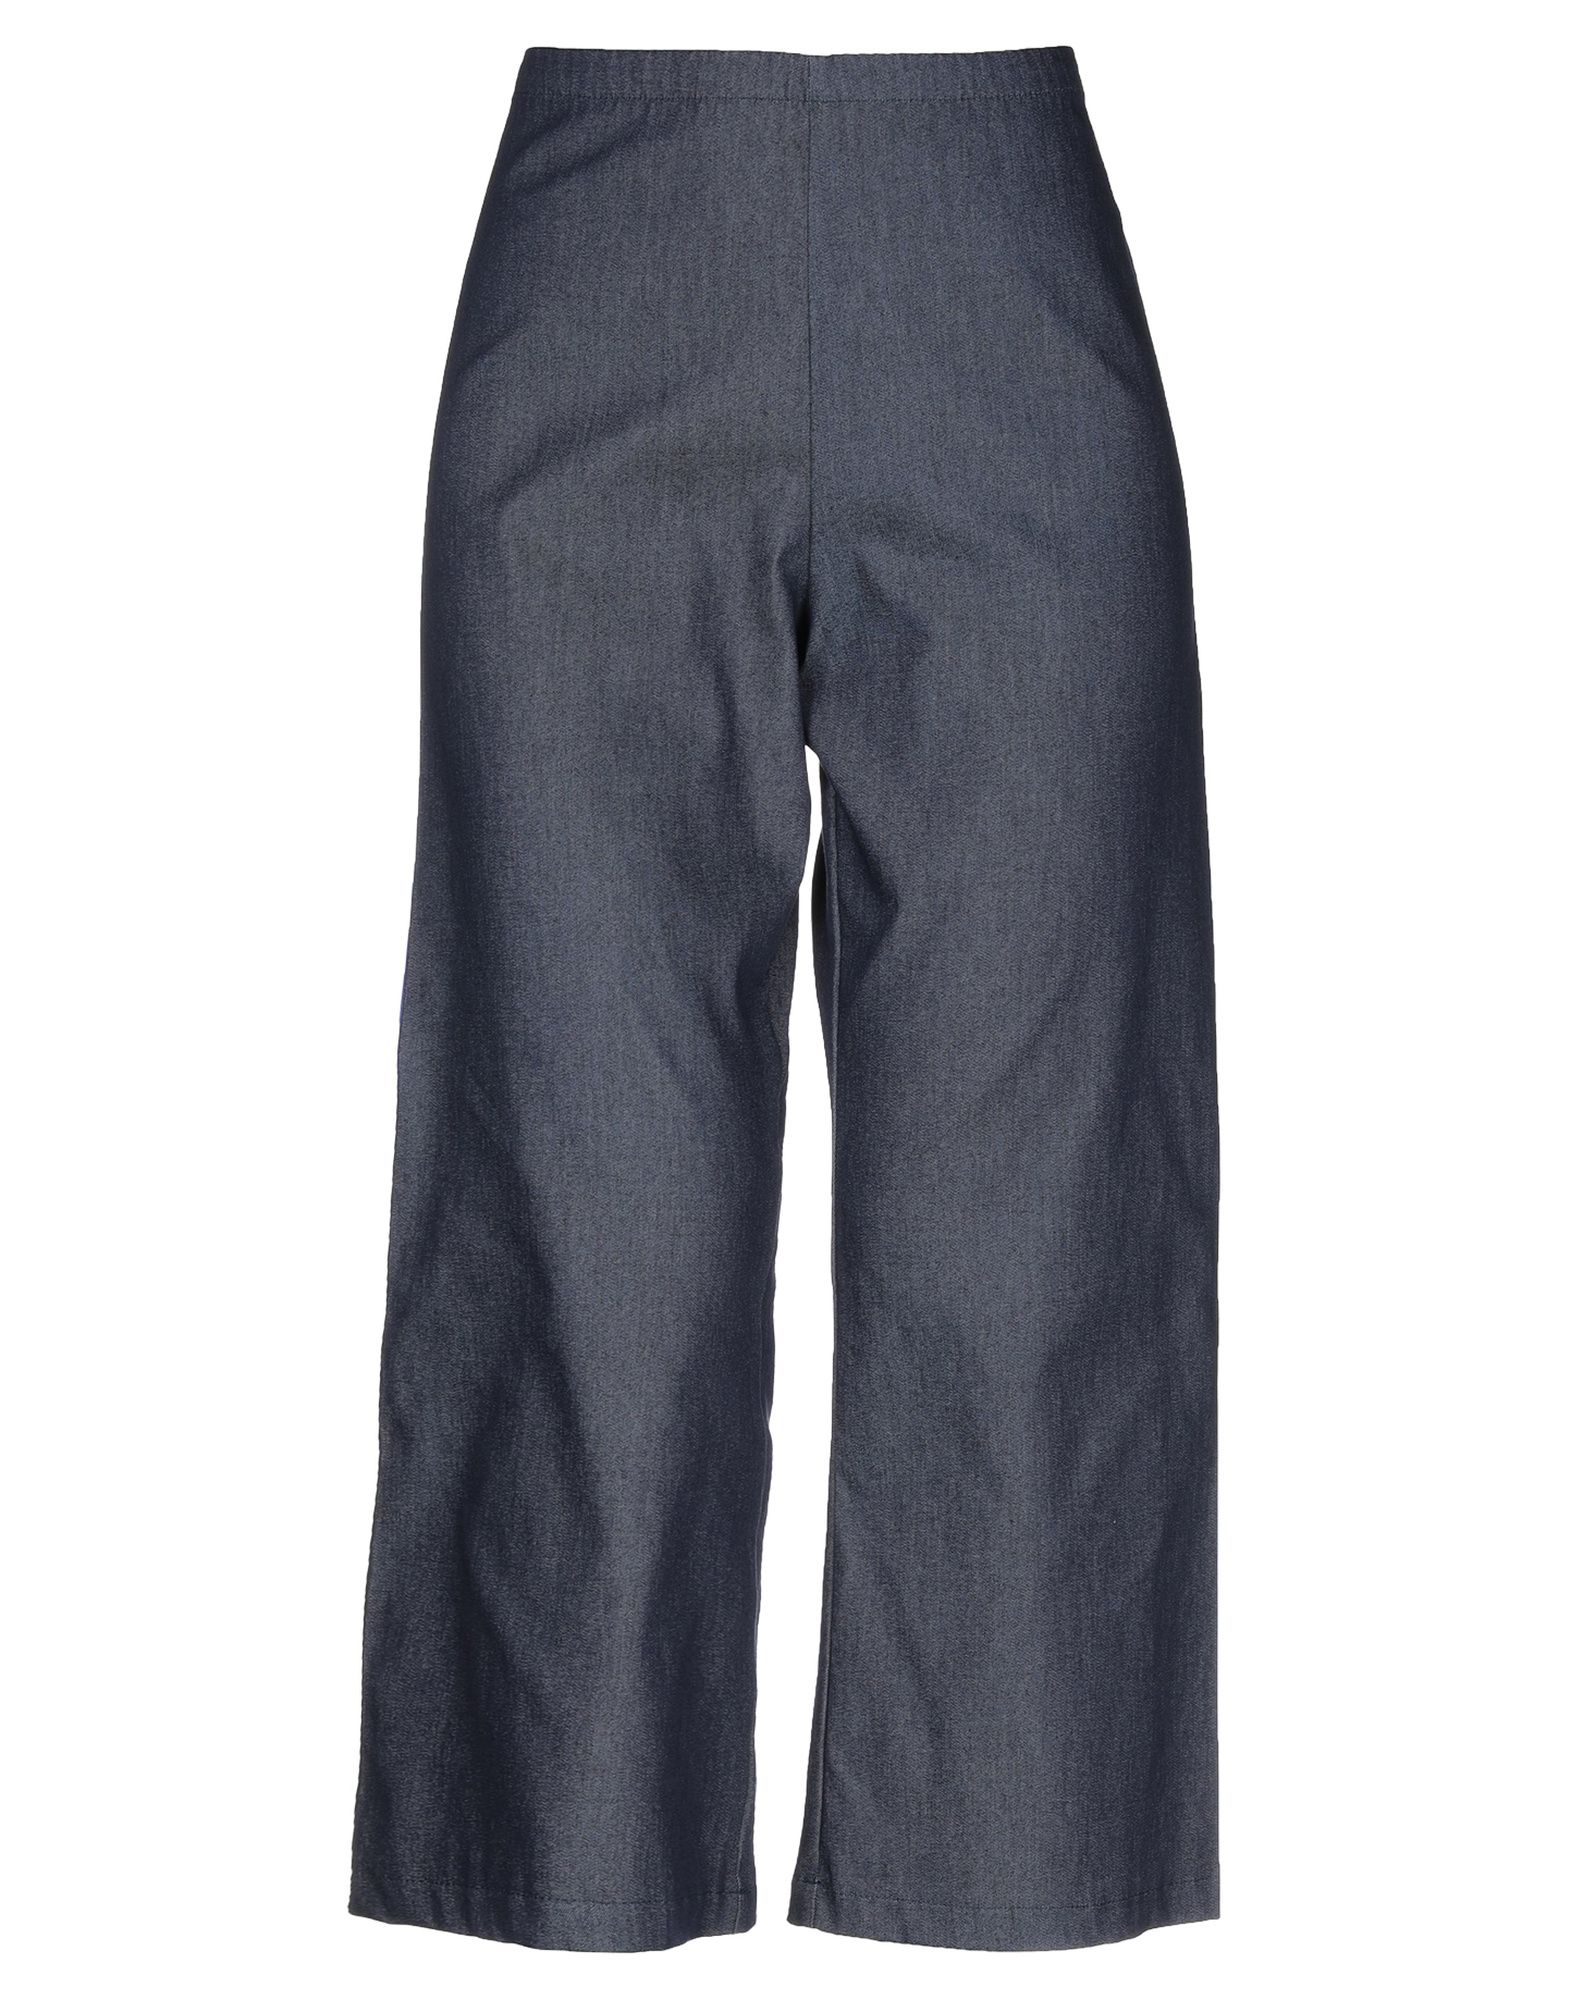 T.D.D. TEN-DAY DELIVERY Джинсовые брюки t d d ten day delivery повседневные брюки